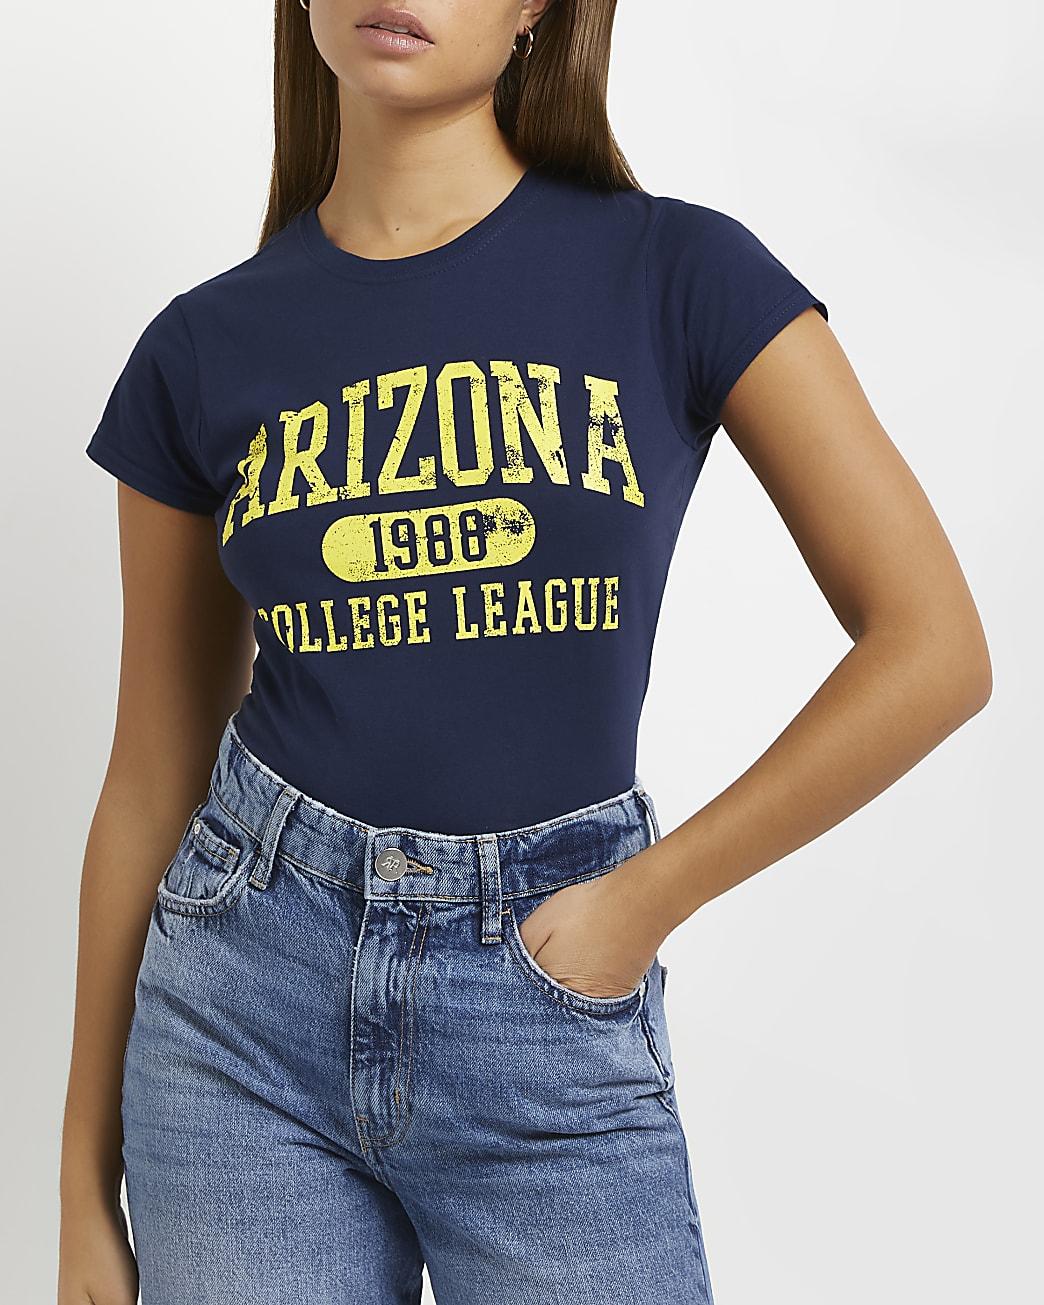 Navy graphic print t-shirt